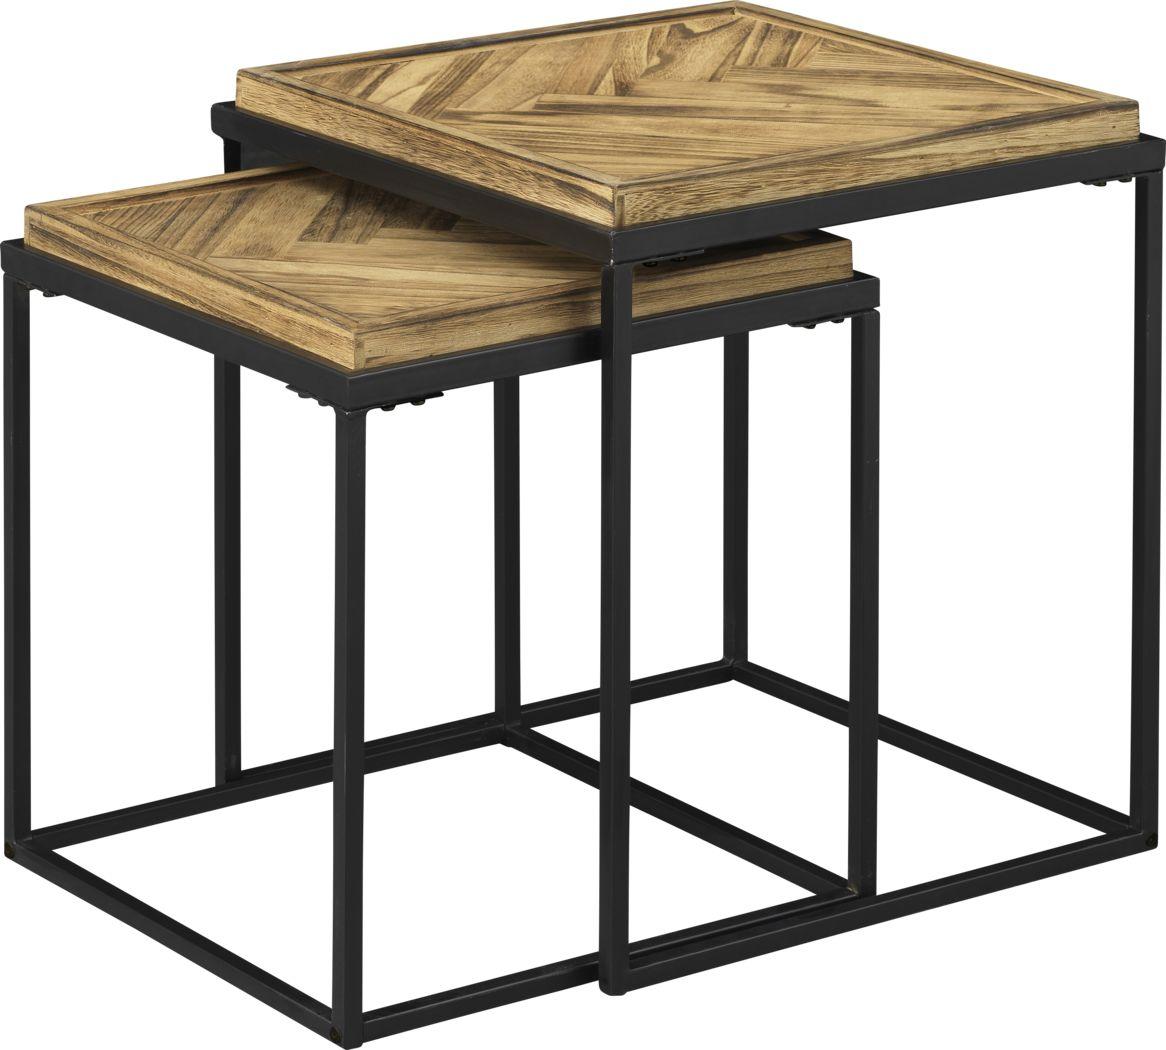 Jernigan Brown Nesting Tables, Set of 2